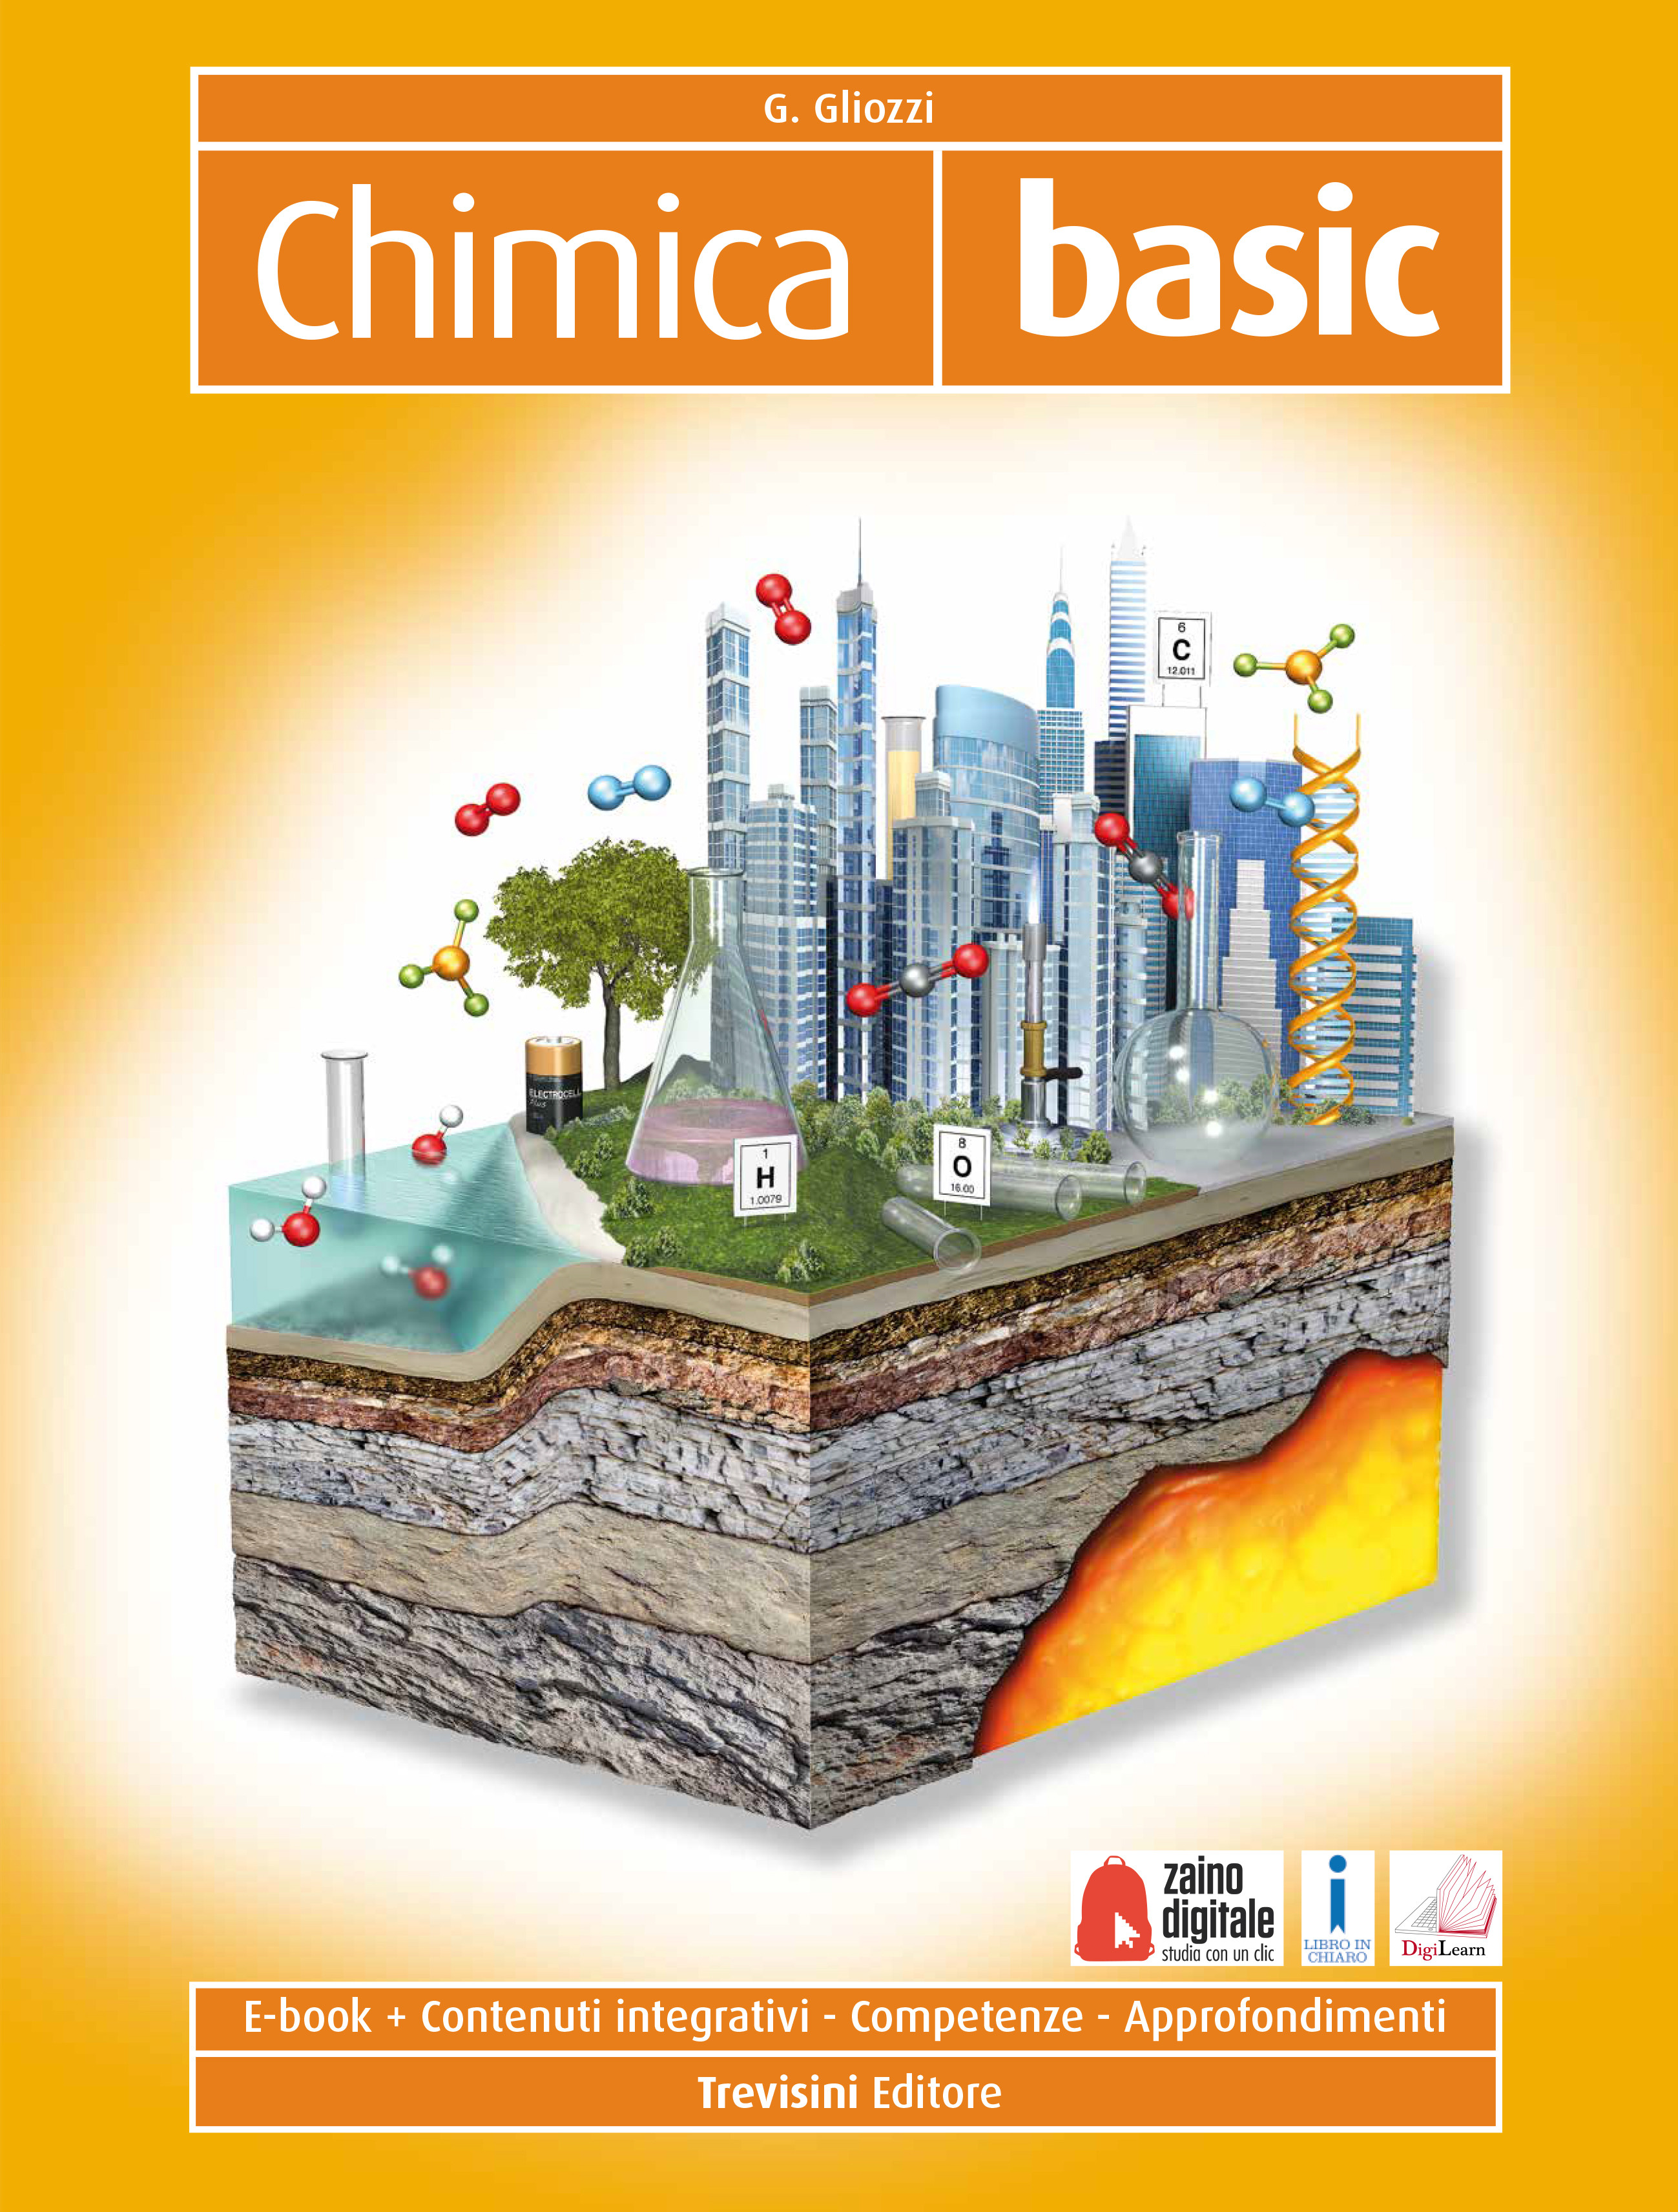 Chimica basic